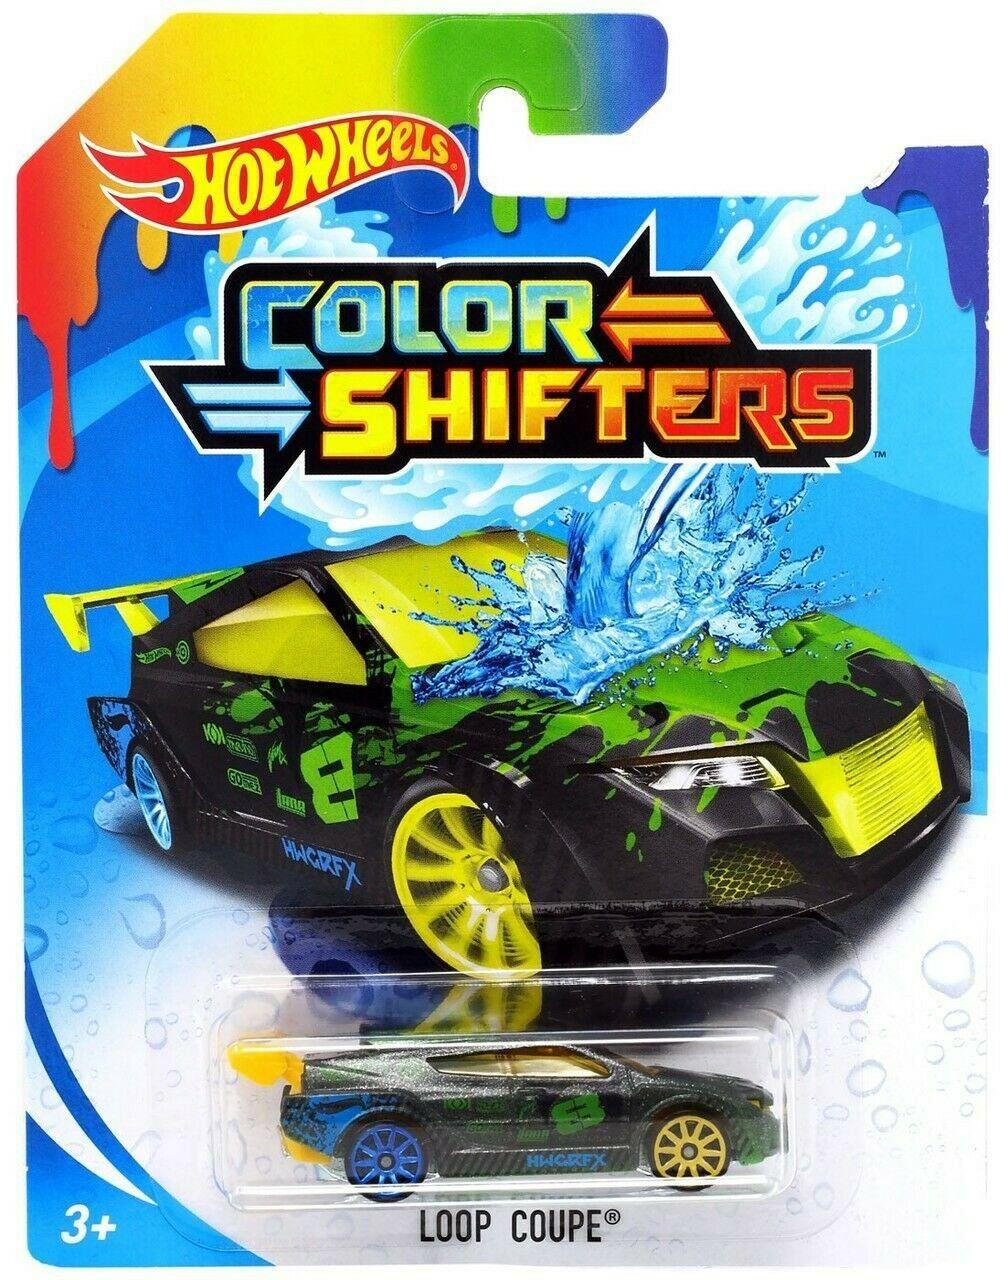 Carrinho Hot Wheels Colour Shifters: Loop Coupe - Mattel